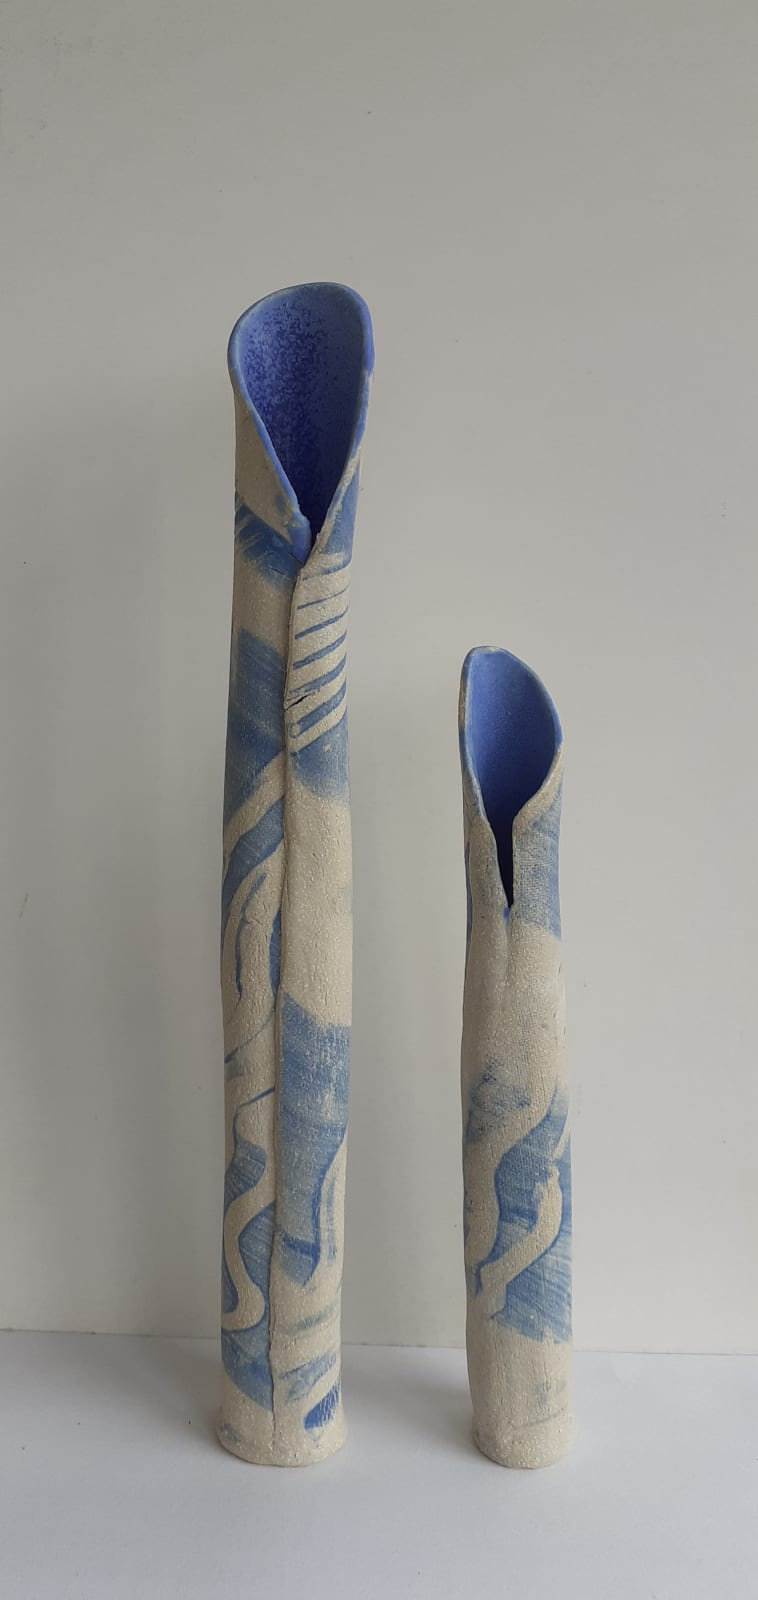 Wenna Crockatt, Cylinders